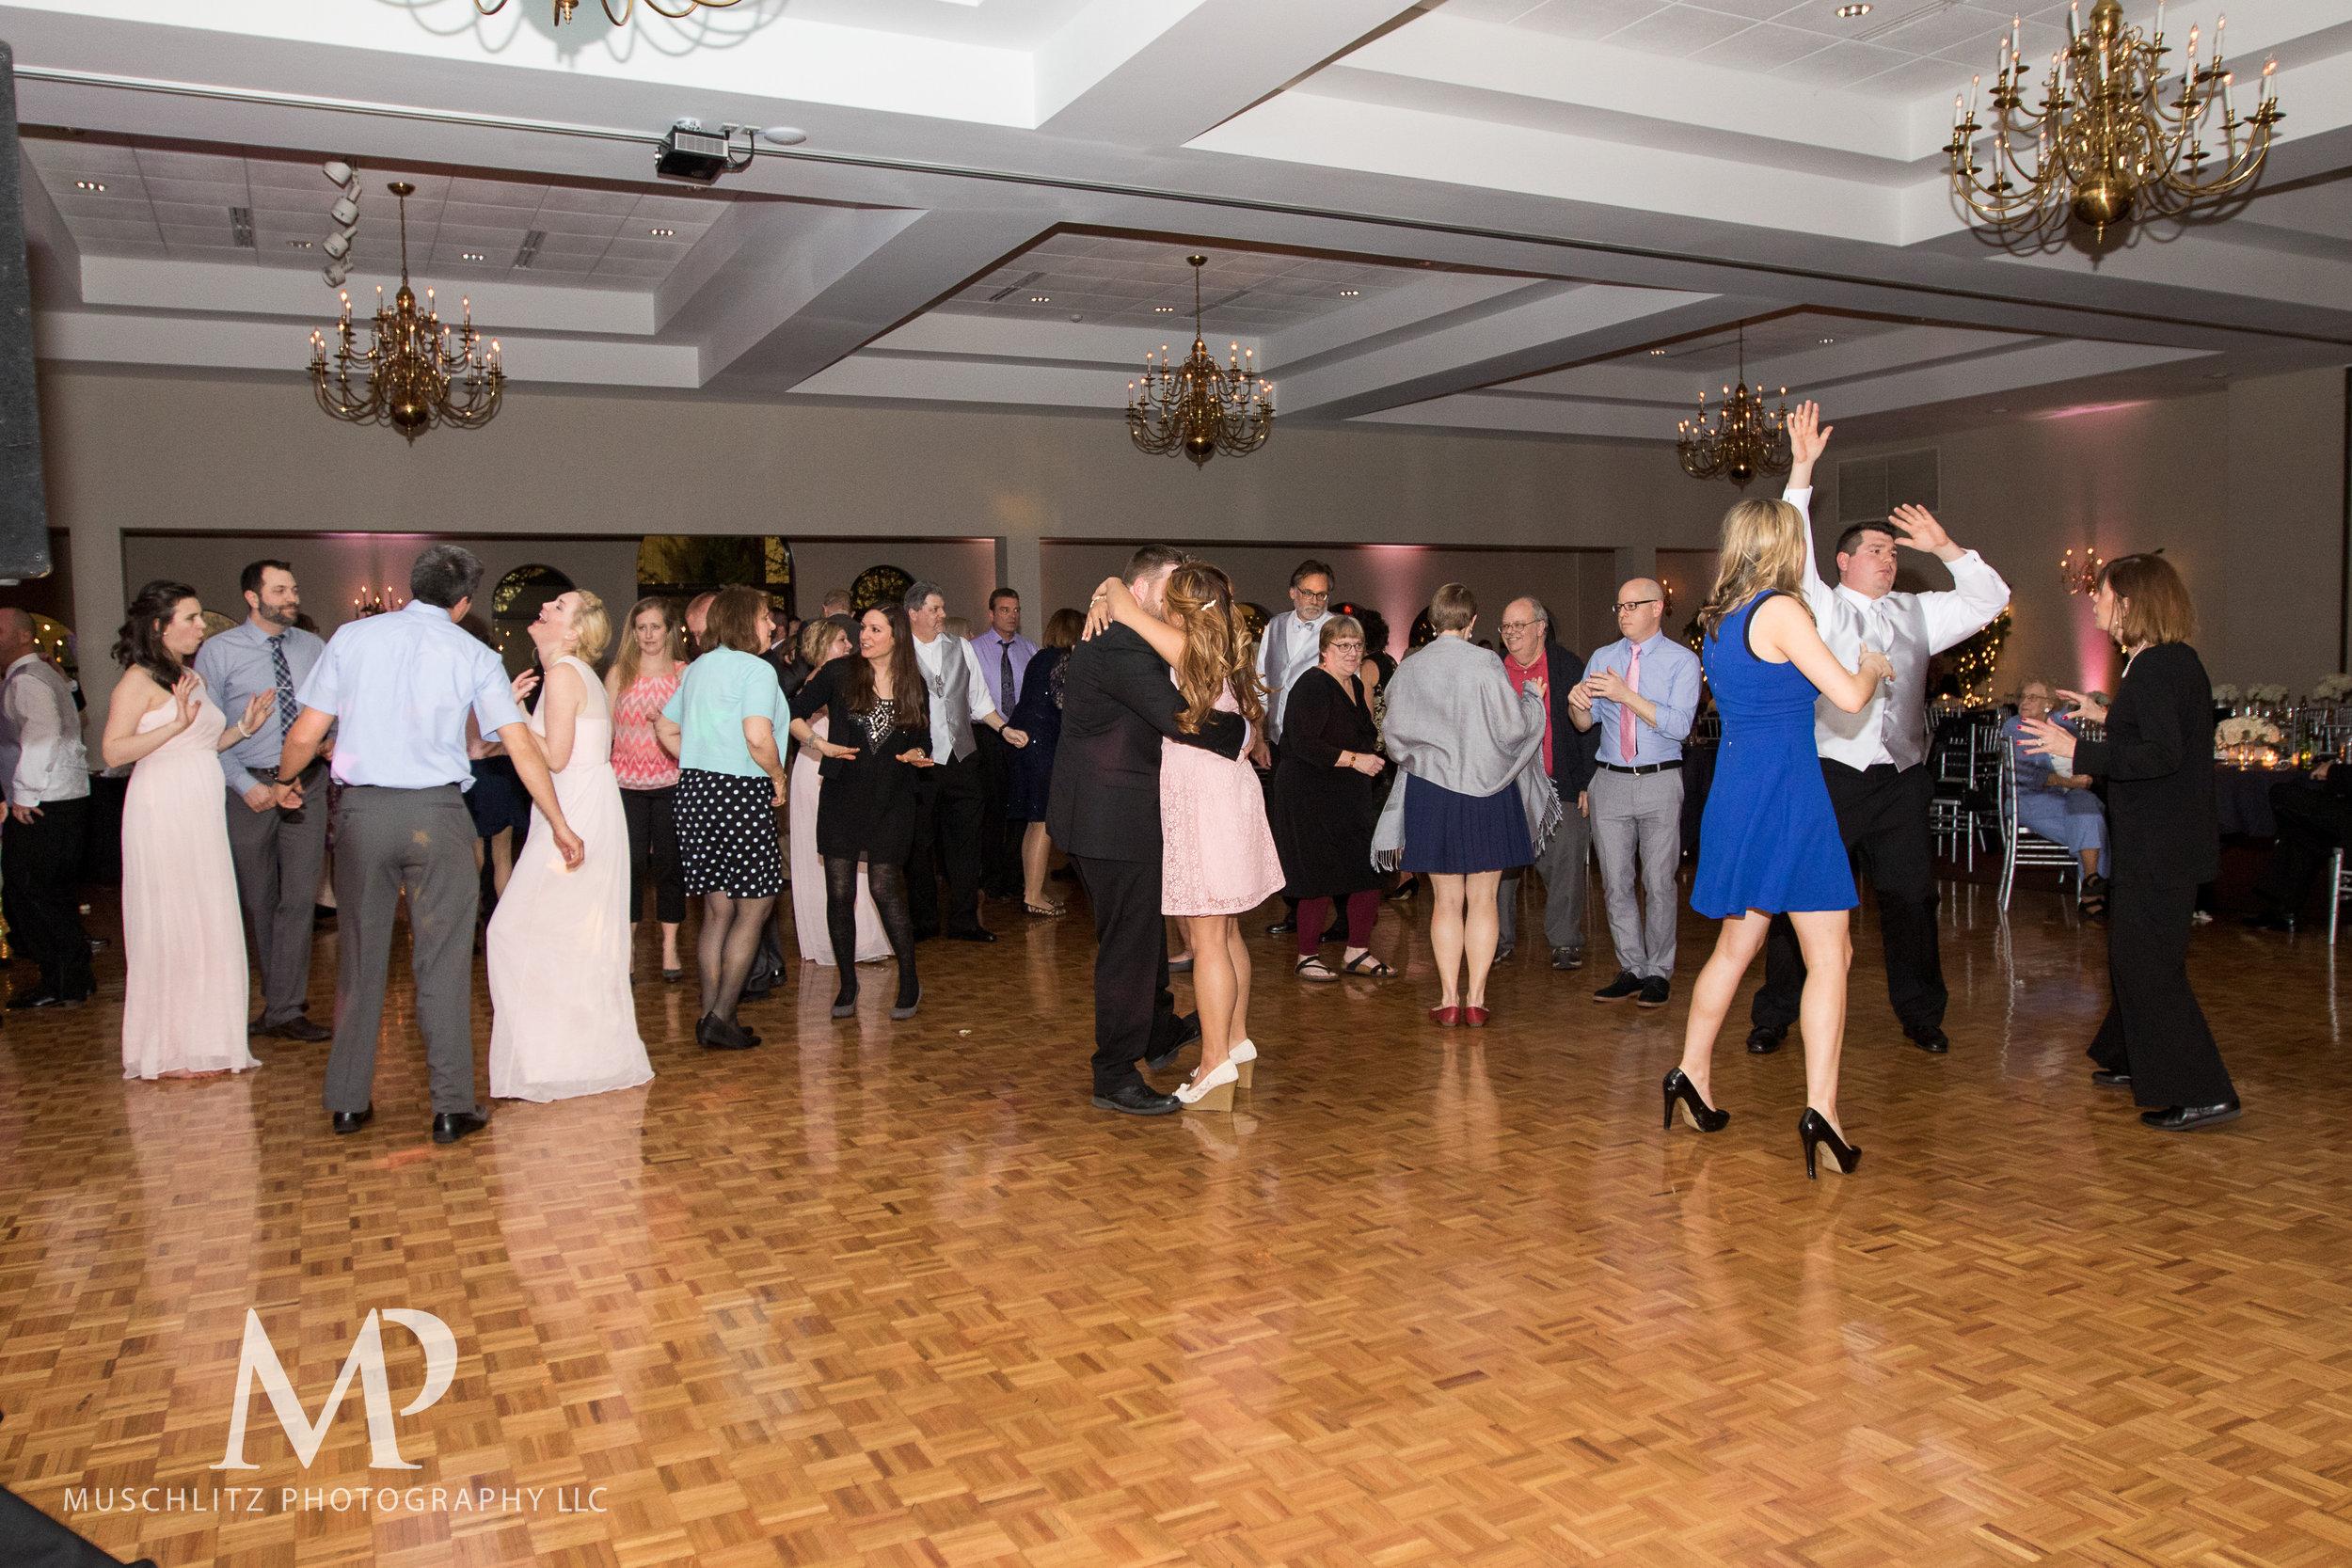 annunciation-banquet-conference-center-downtown-columbus-wedding-reception-downtown-columbus-ohio-muschlitz-photography-027.JPG